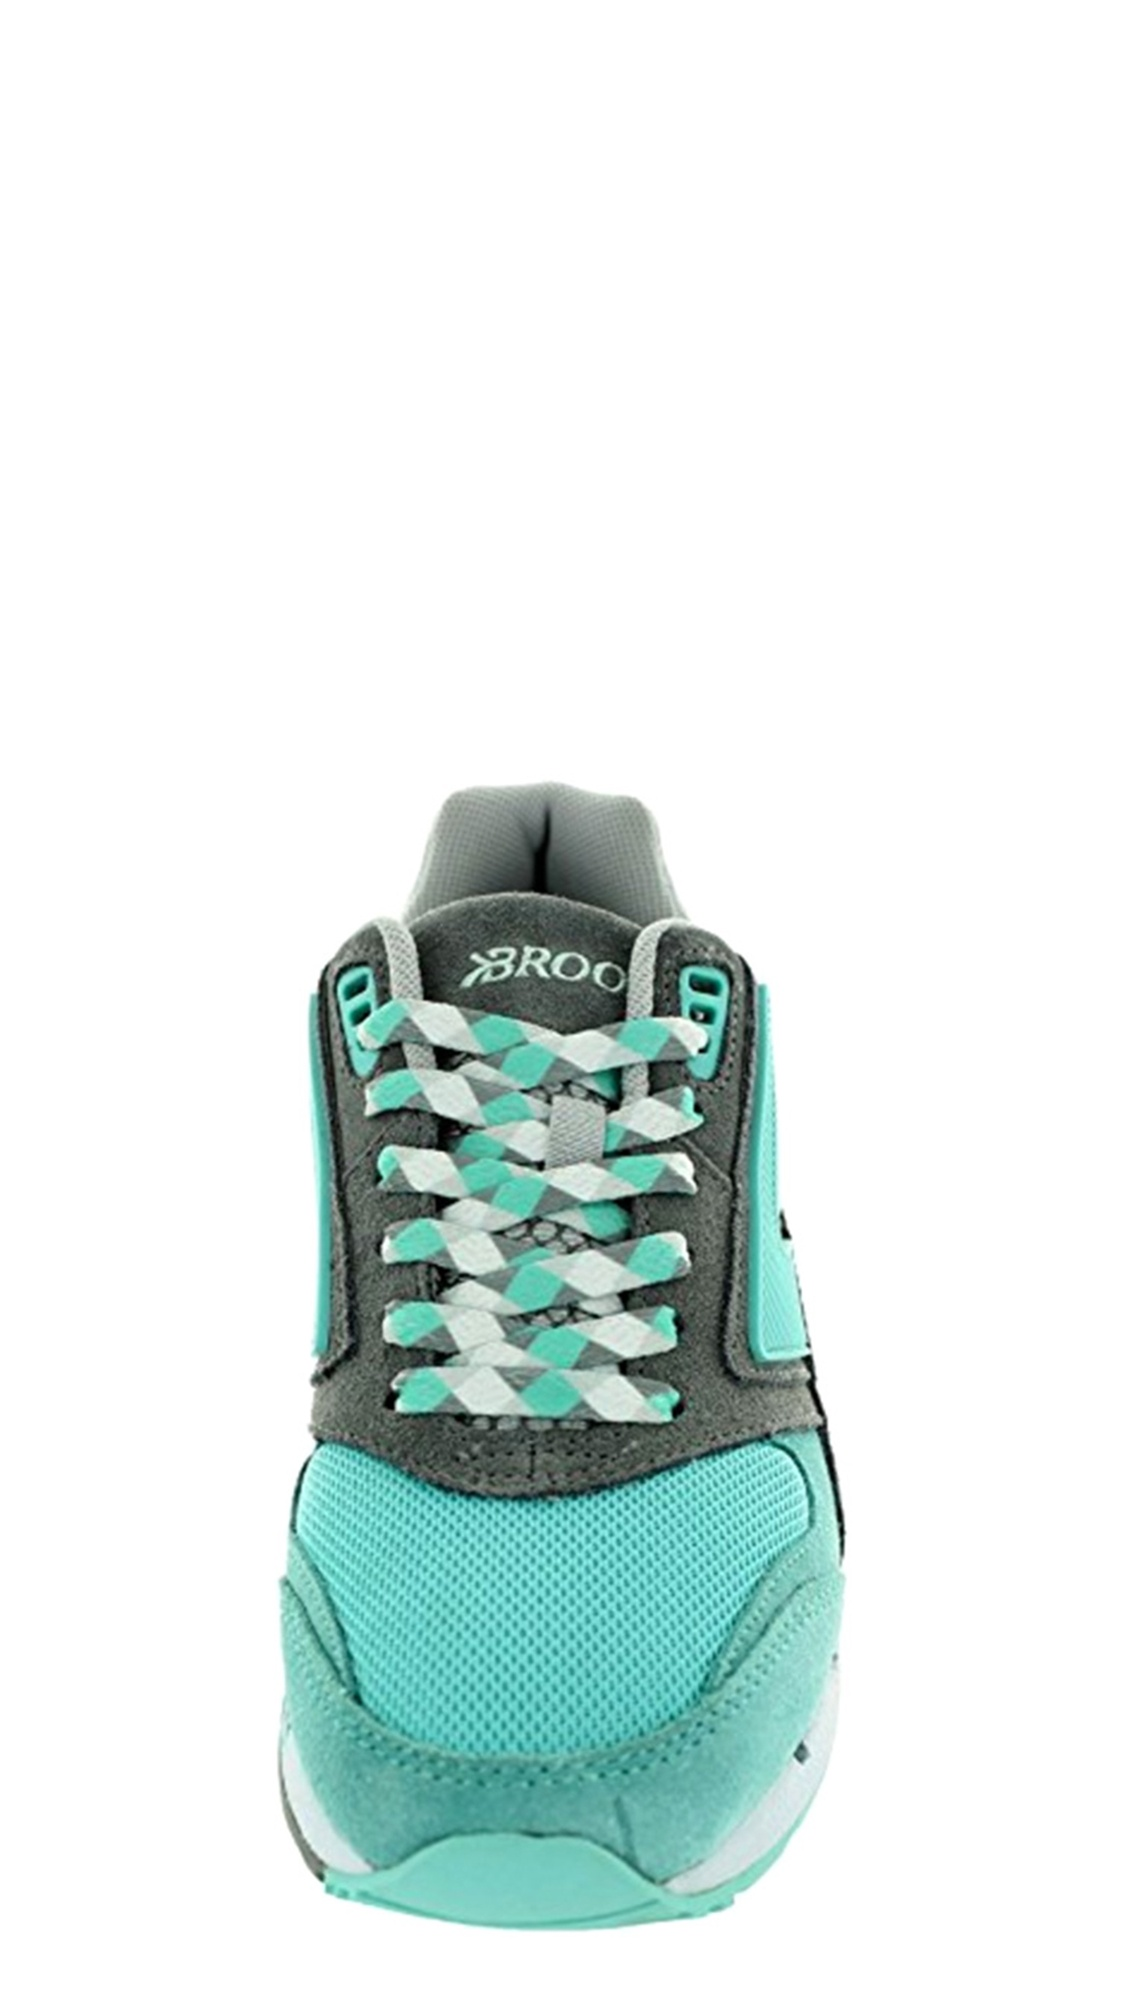 eede5688b80 Brooks - Brooks Women s Fusion Heritage Running Shoes 1201871 - Walmart.com